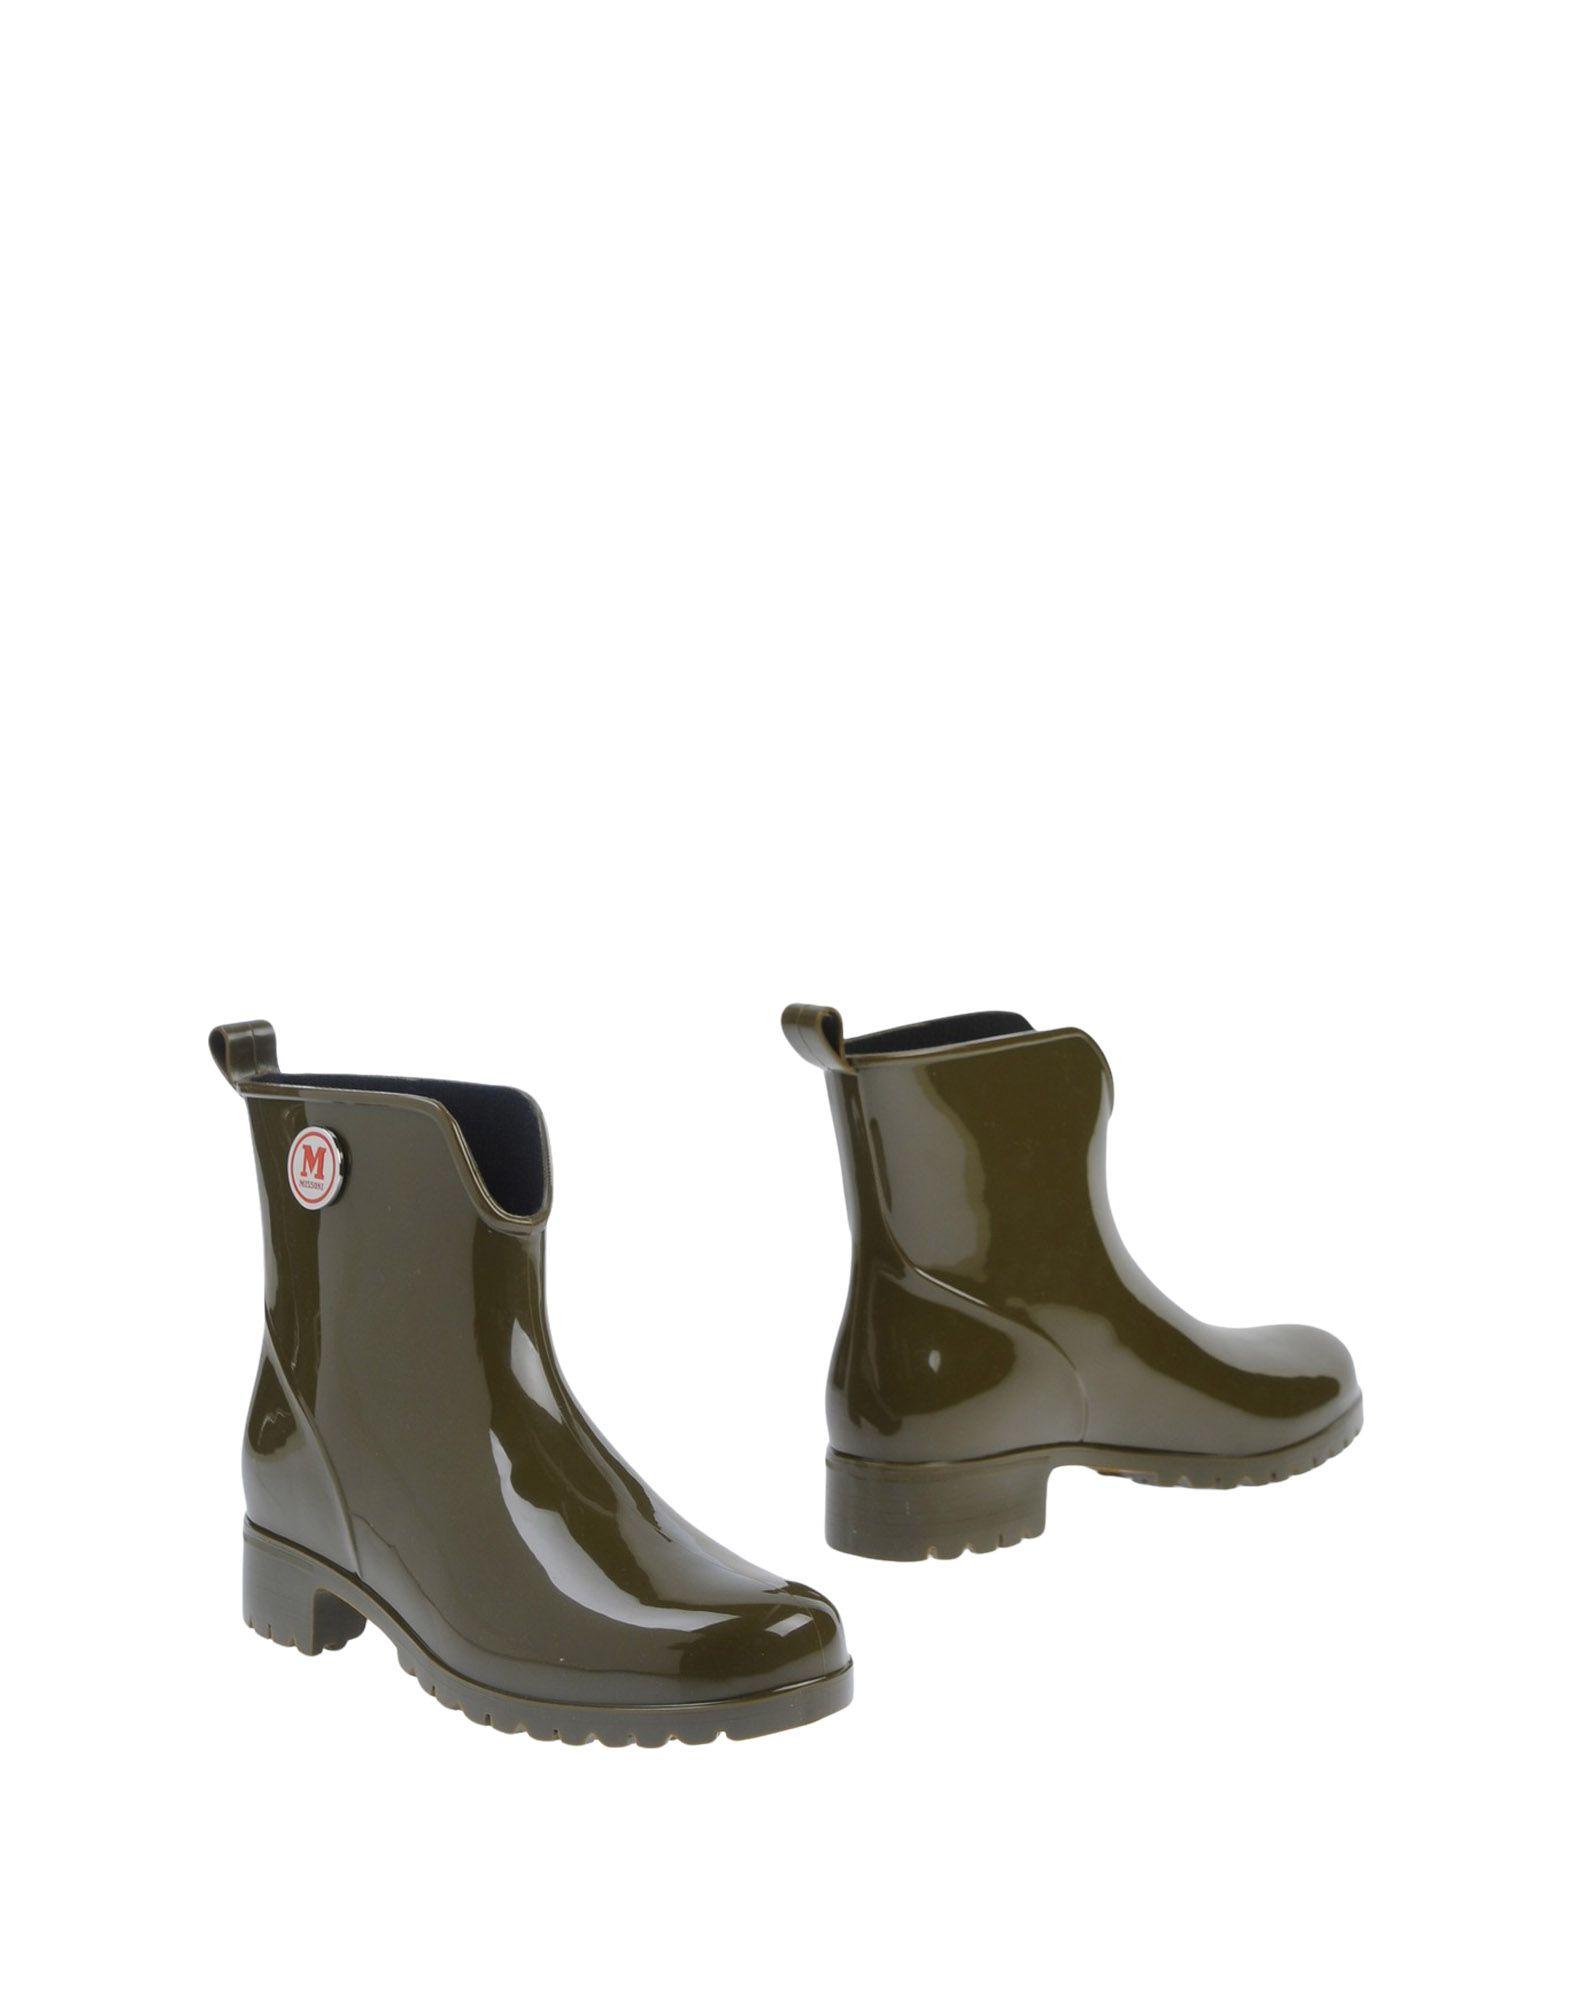 M Missoni Ankle Boot - Women M Missoni Ankle Ankle Ankle Boots online on  United Kingdom - 11001602HG 5de2d7